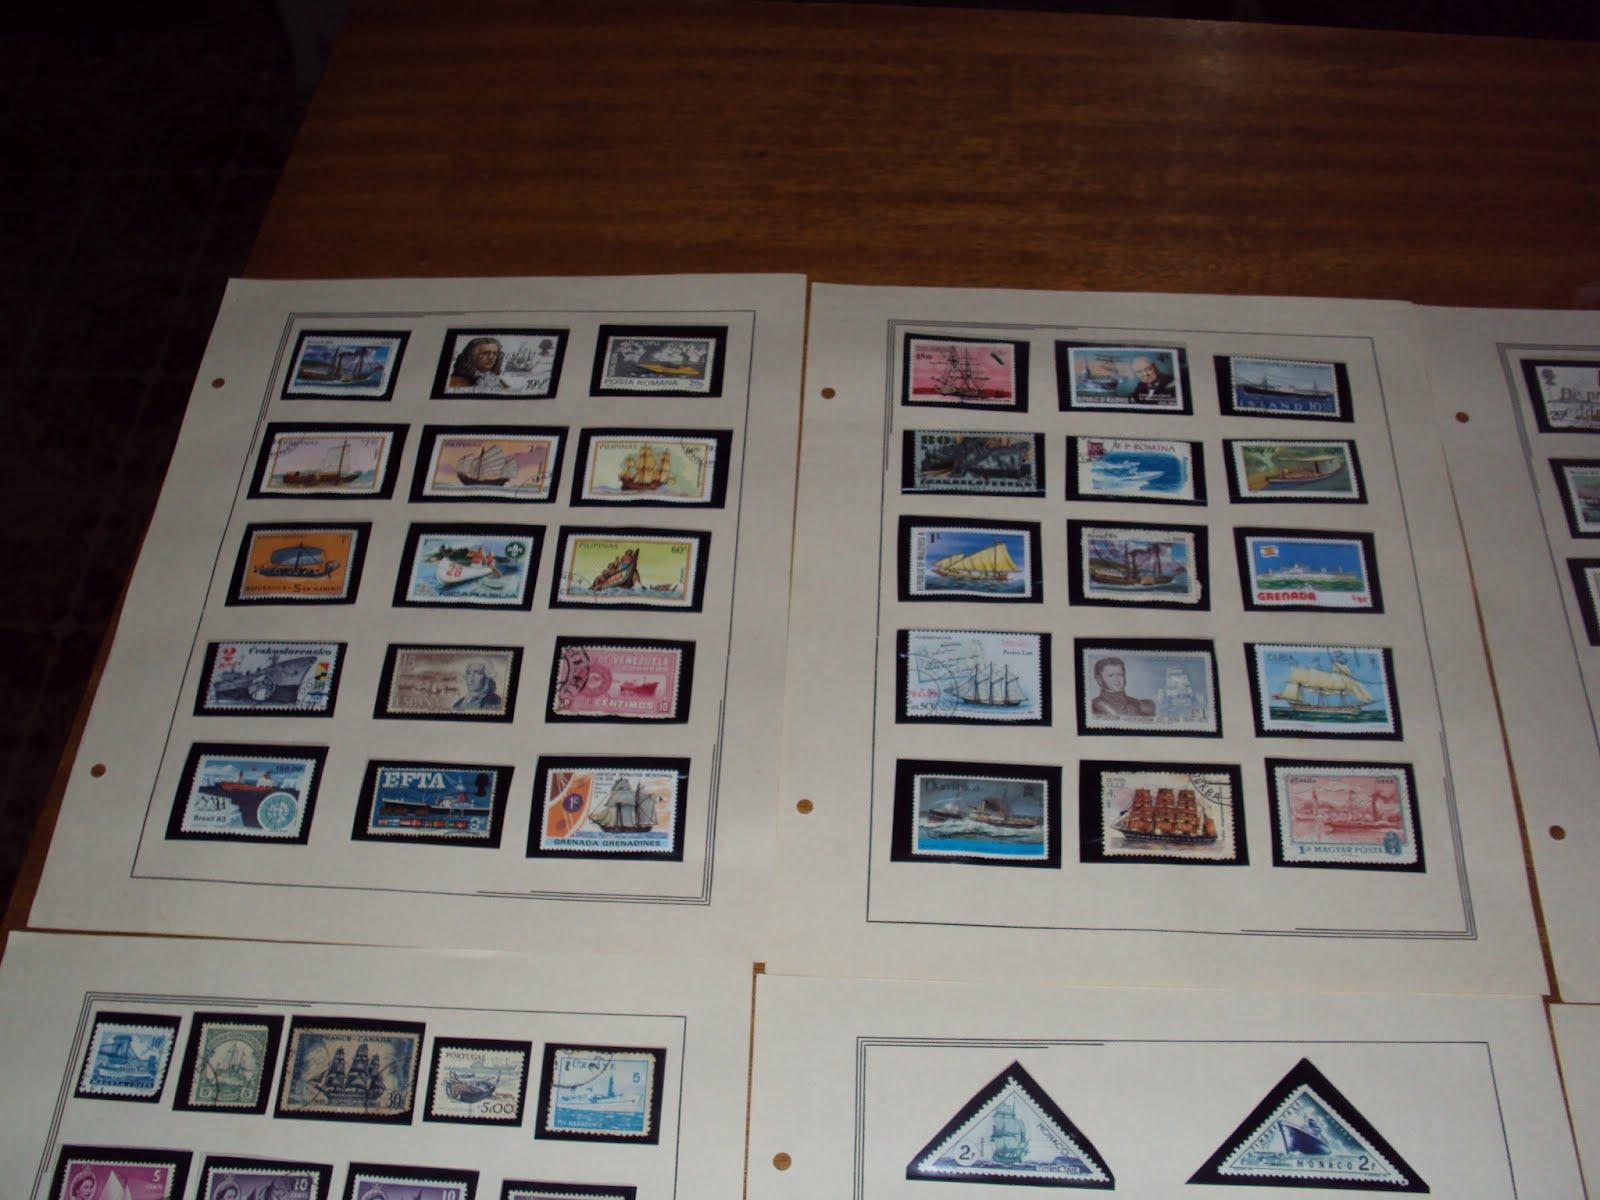 papeis+de+carta+e+selos+034.JPG (1600×1200)